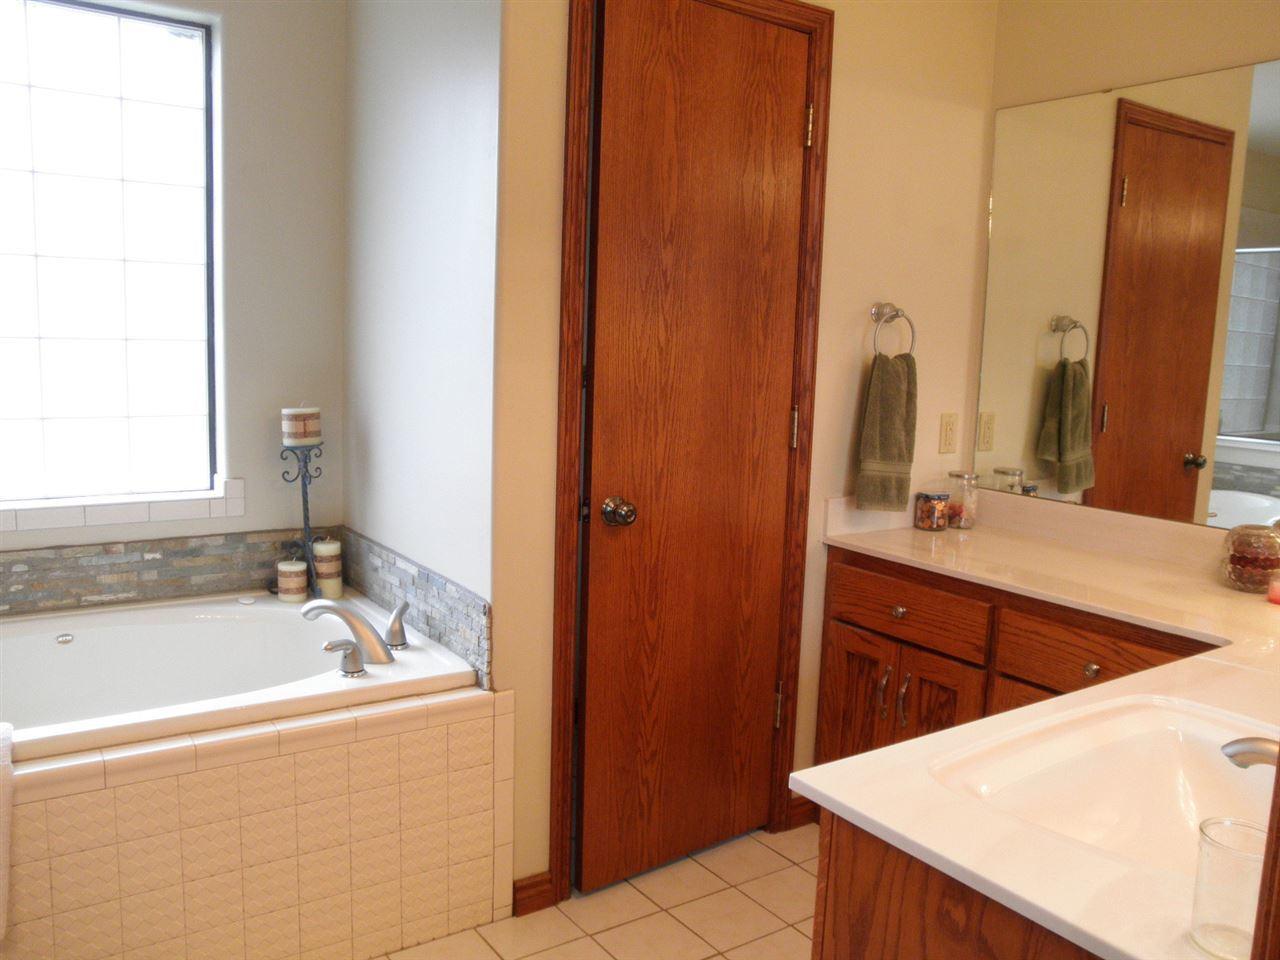 Sold Intraoffice W/MLS | 6855 Lake Road  Ponca City, OK 74604 18